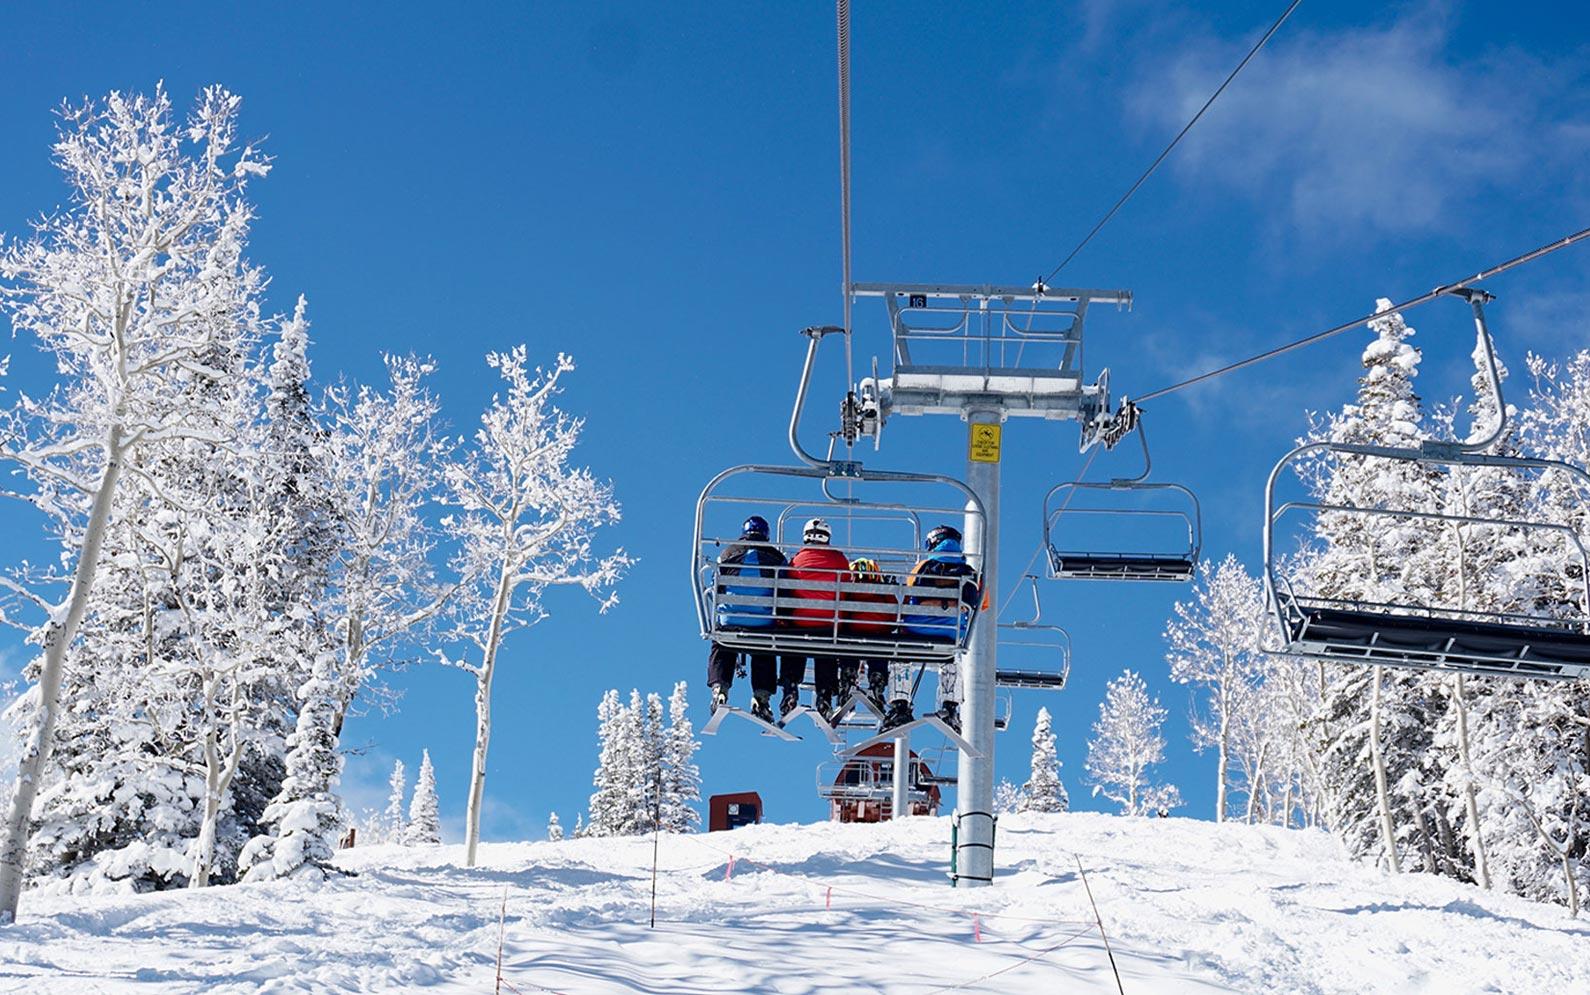 Riding the ski lift to the slopes